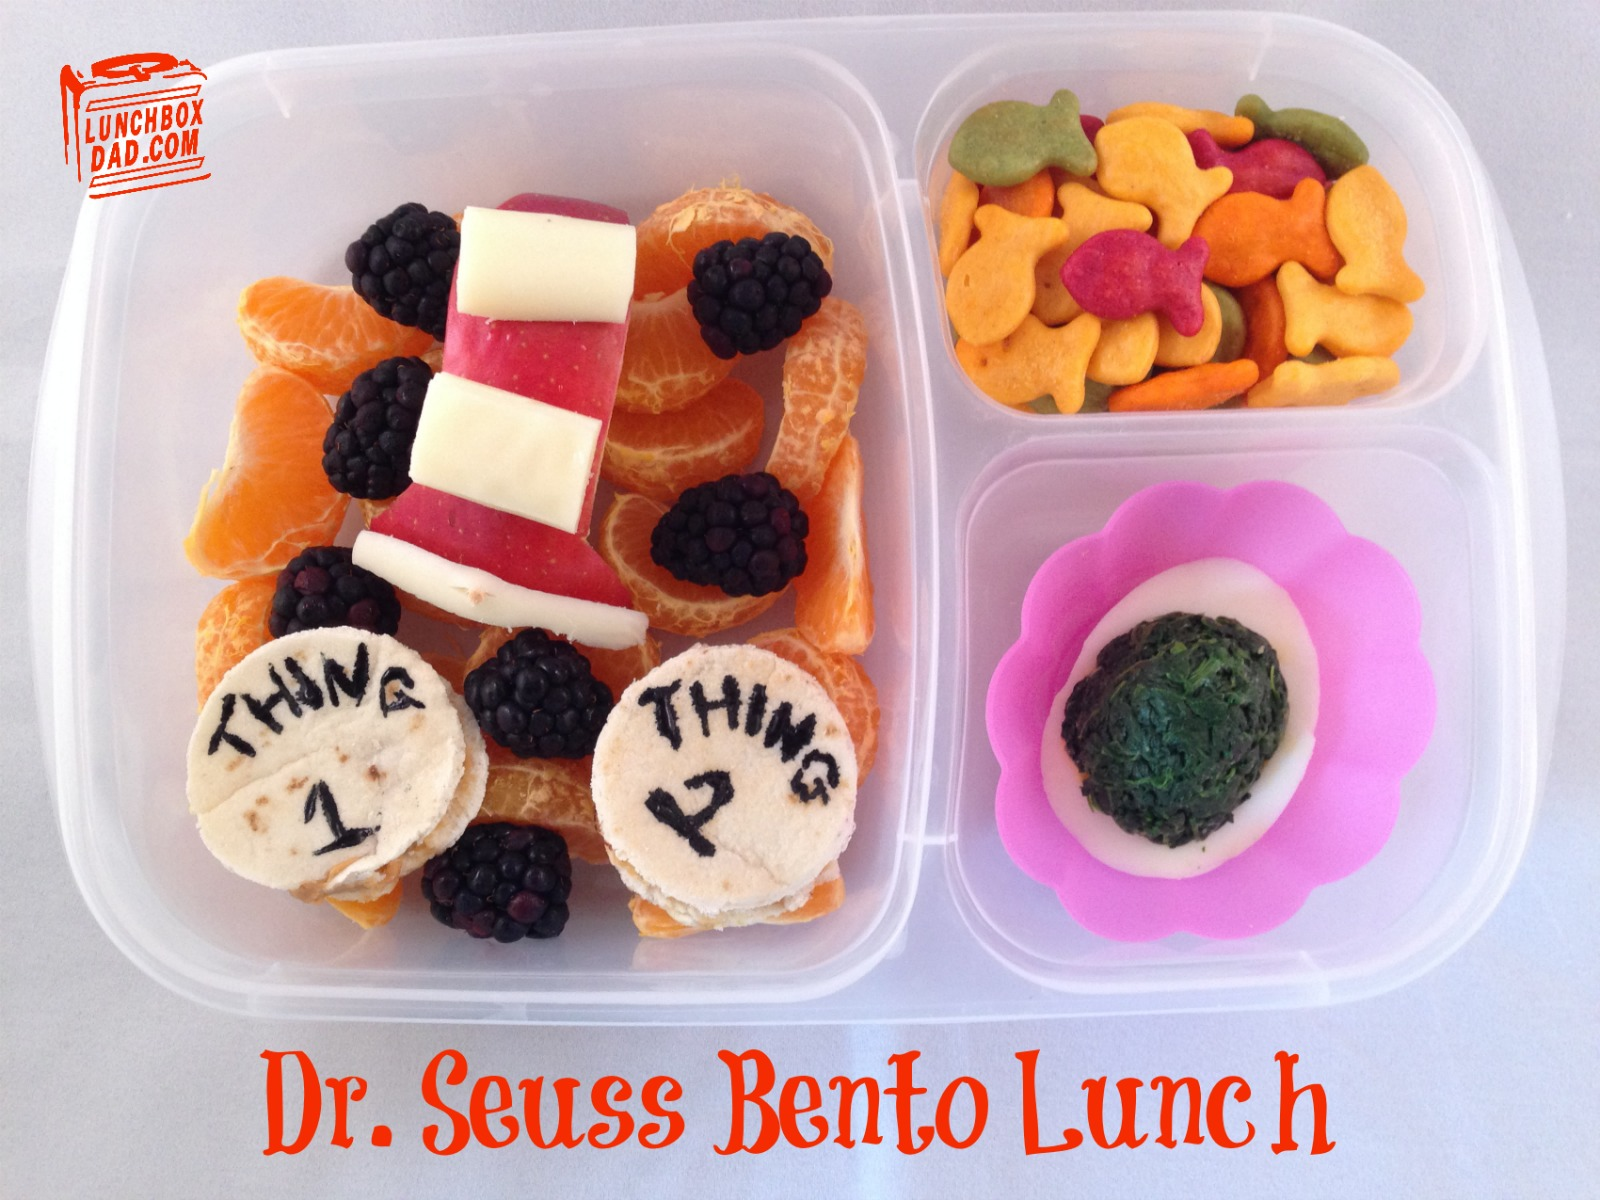 Dr. Seuss Bento Lunch